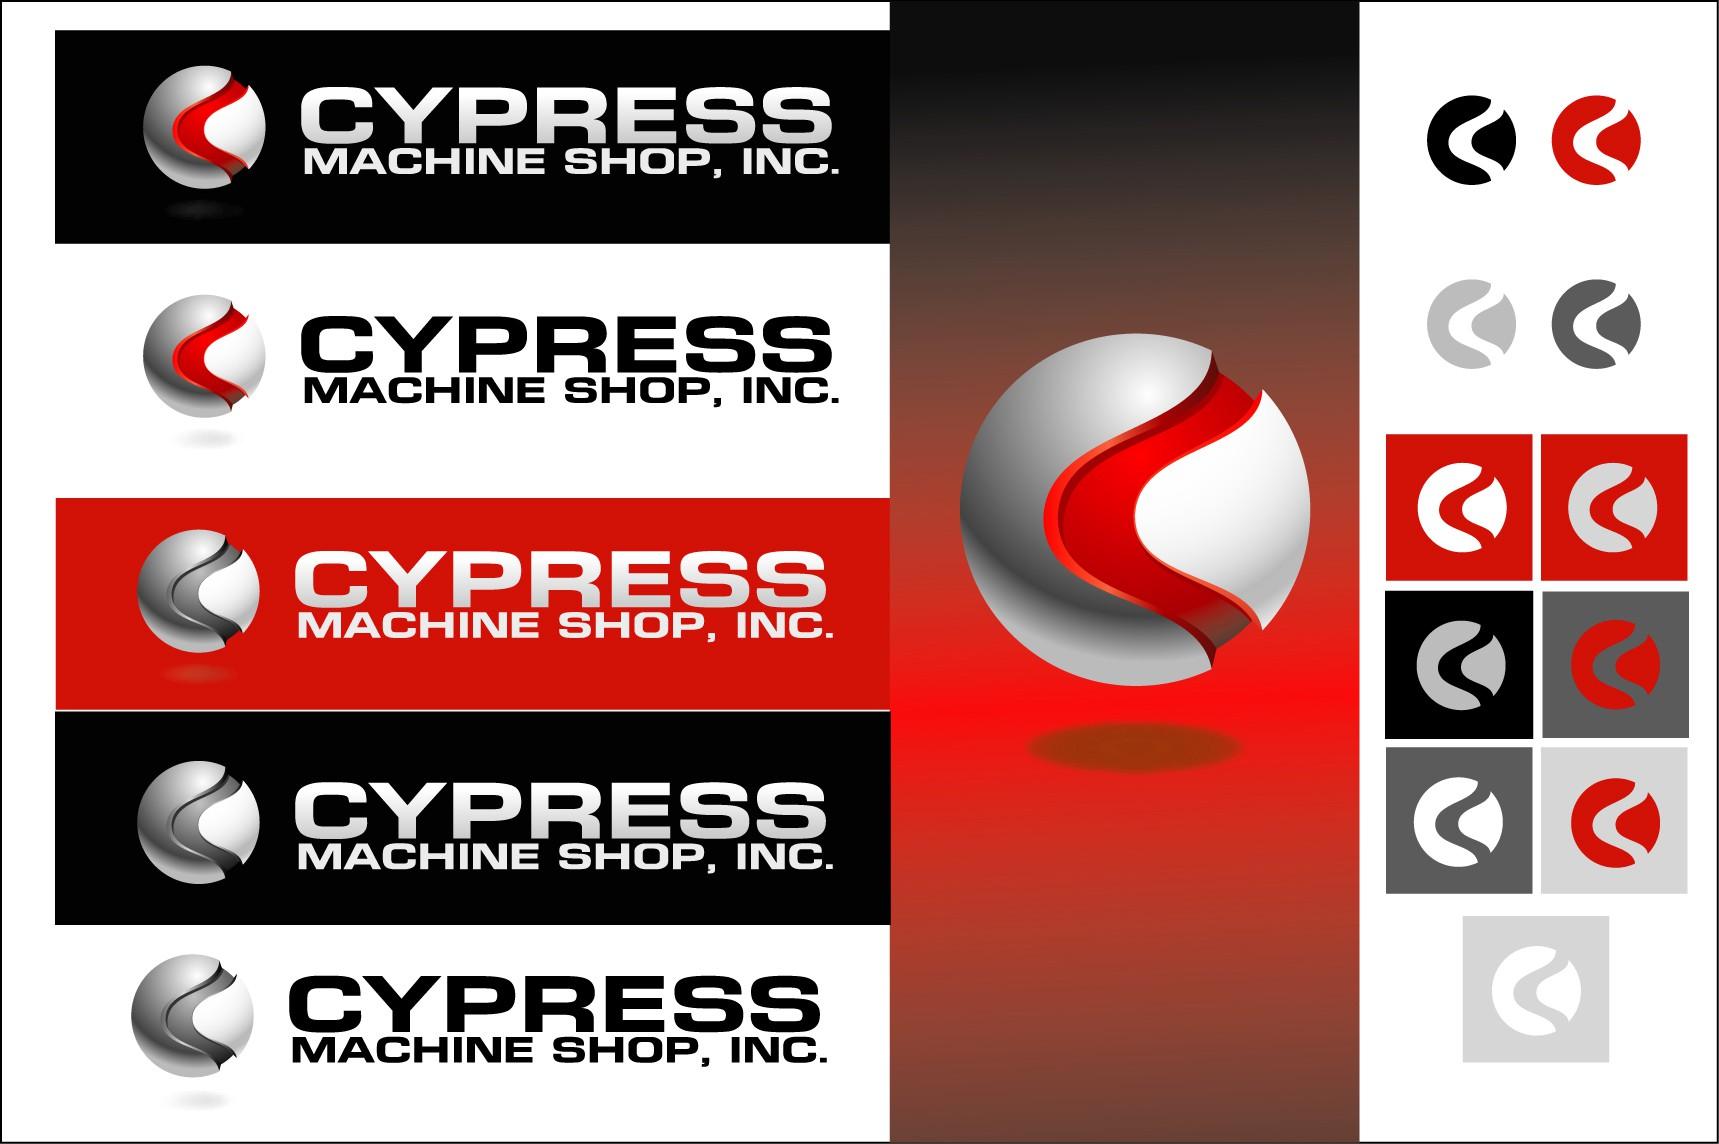 HELP PLEASE!! Cypress Machine Shop, Inc. needs a great new logo.